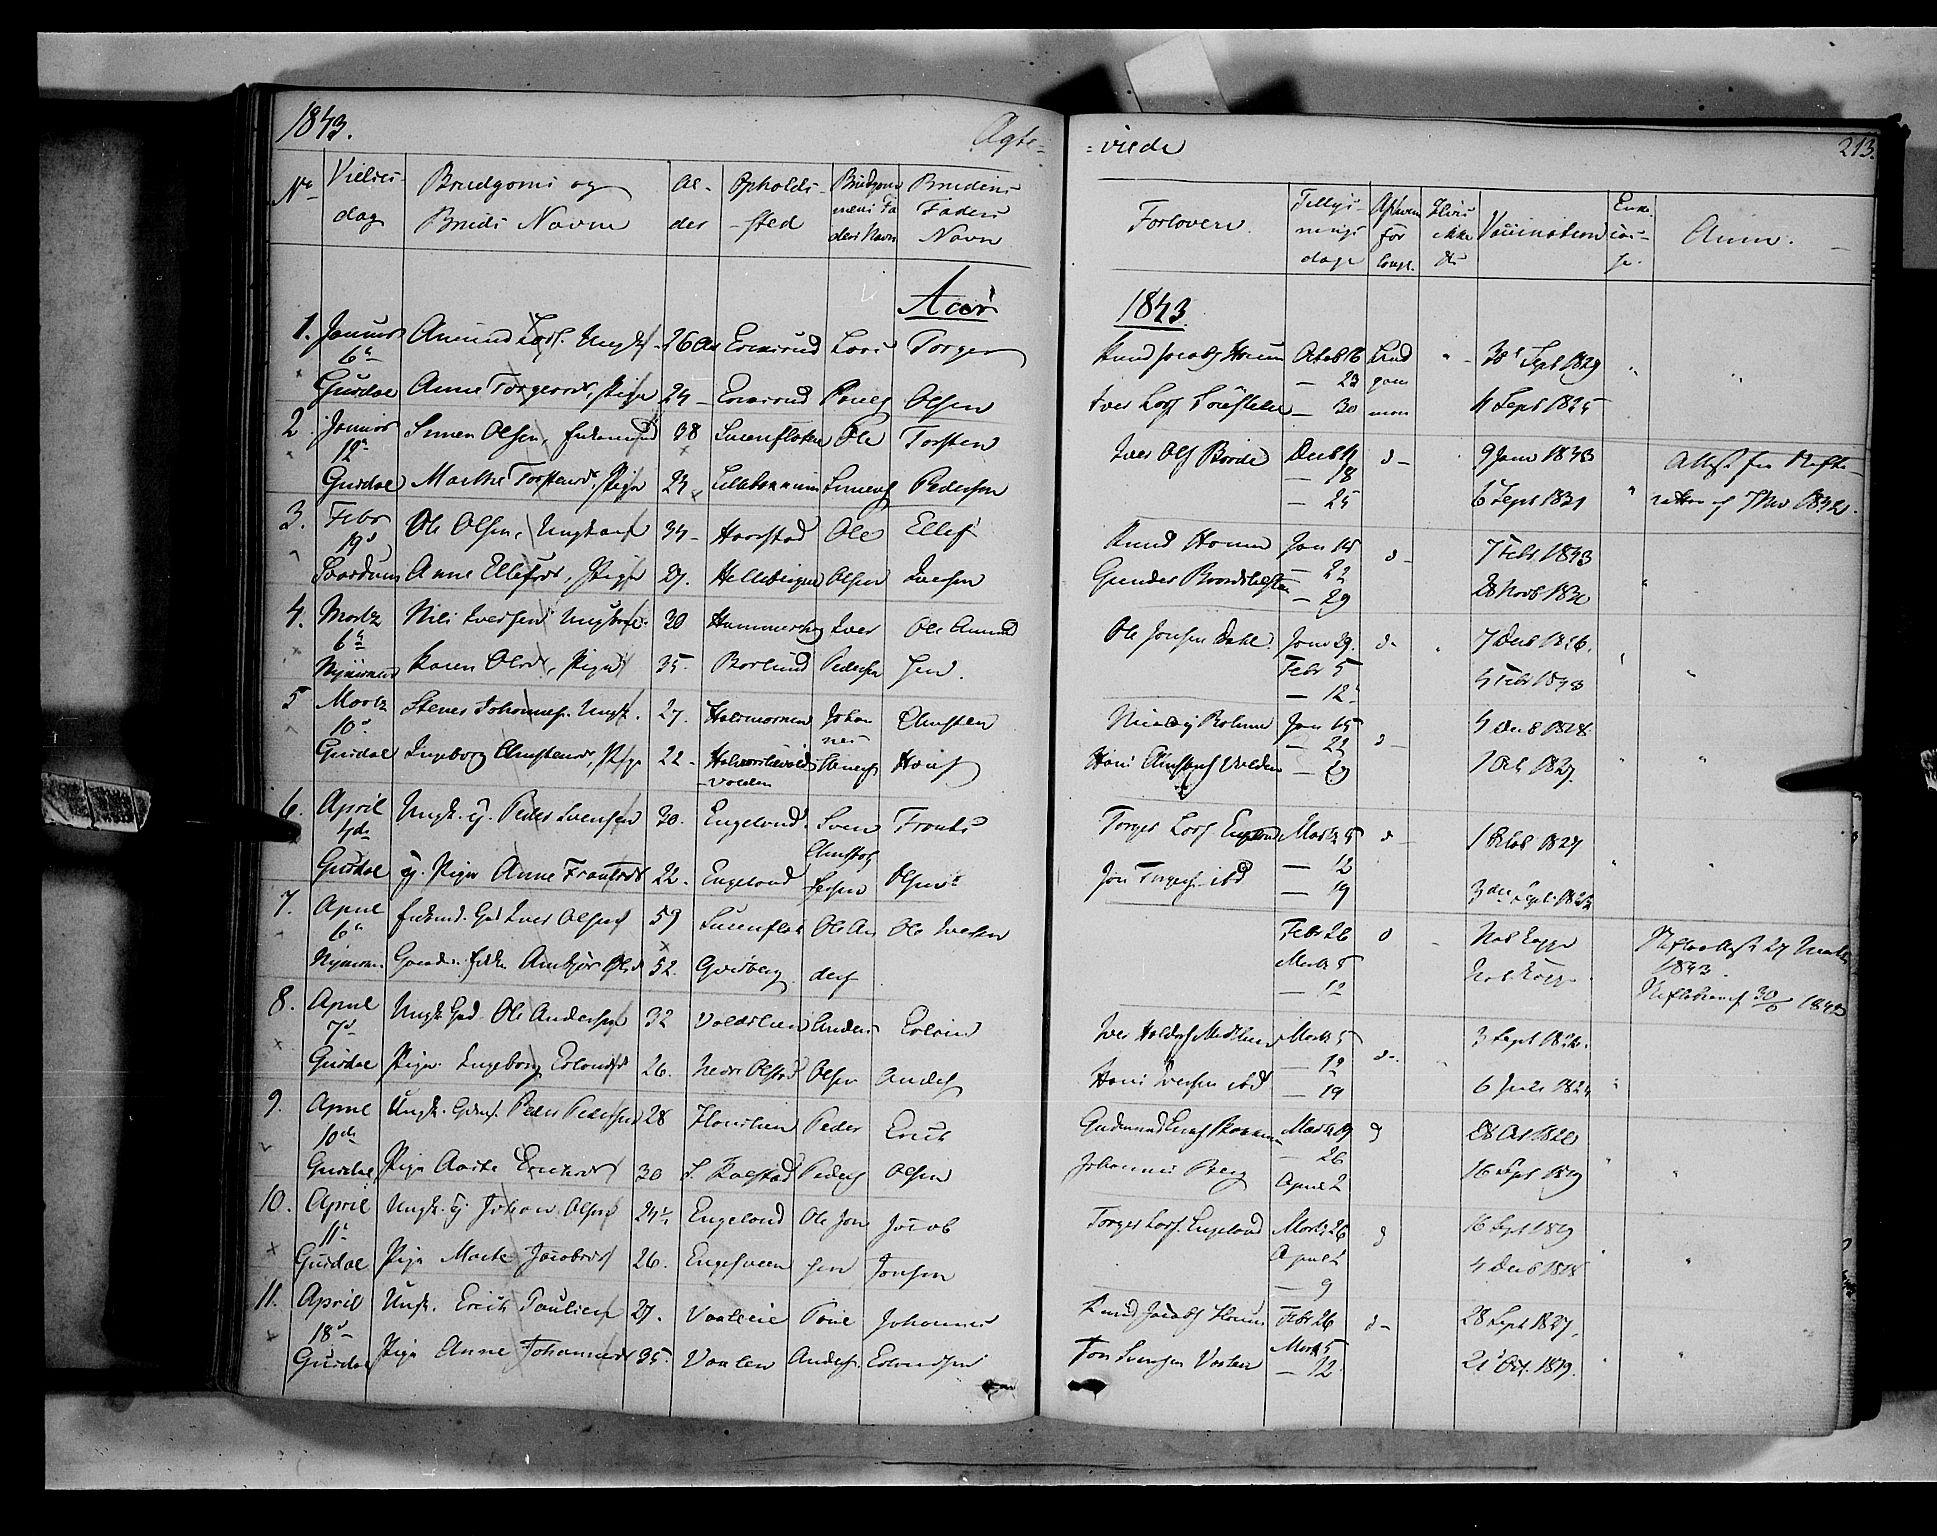 SAH, Gausdal prestekontor, Ministerialbok nr. 7, 1840-1850, s. 213